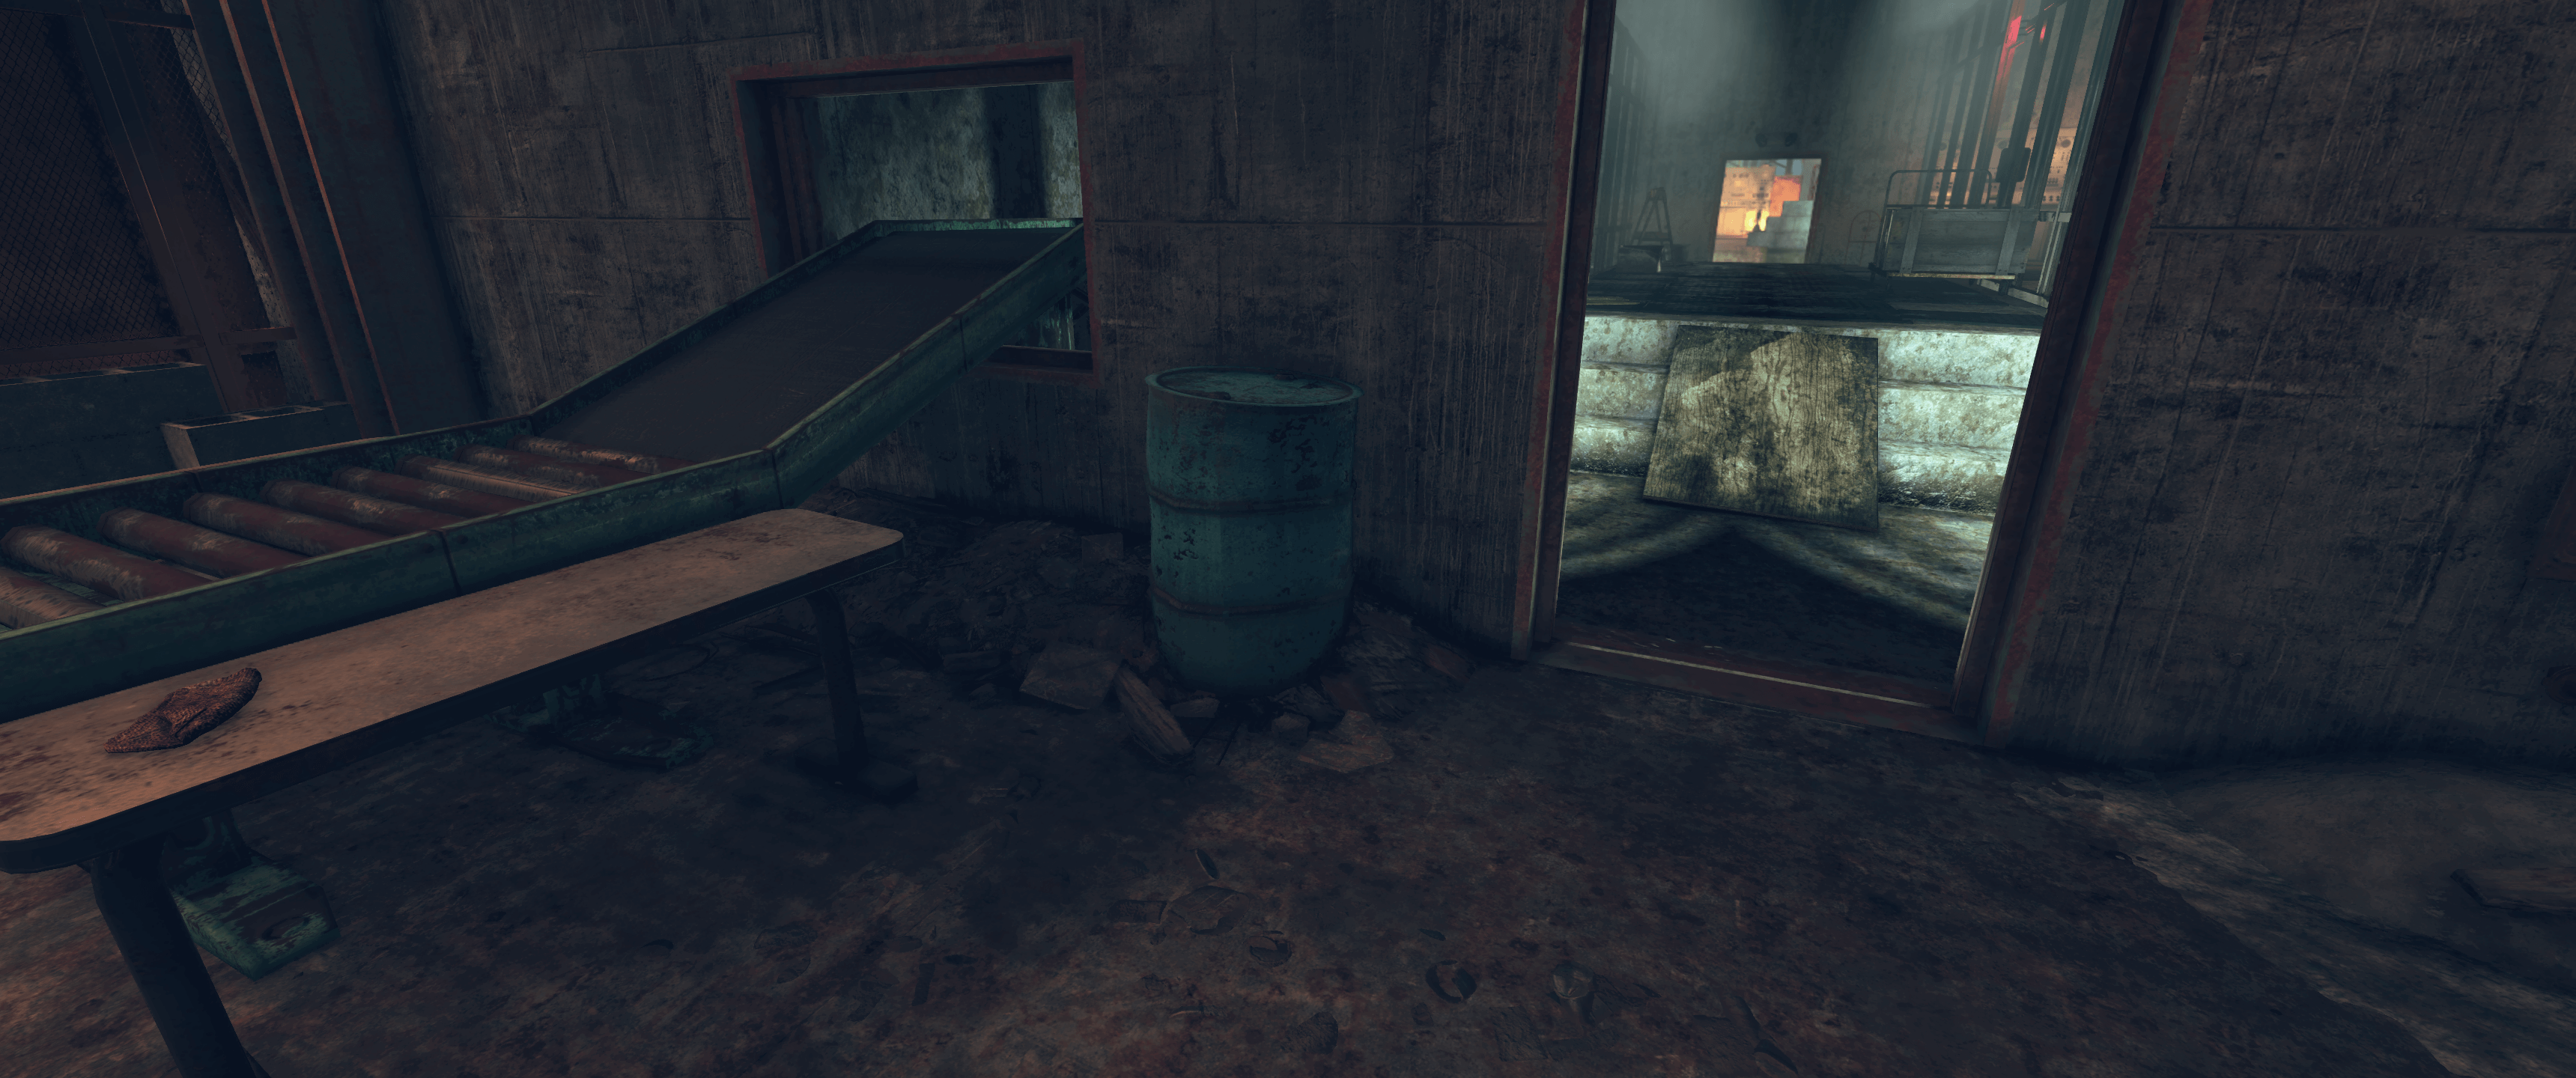 Fallout 76 - Tonne in der Mitte